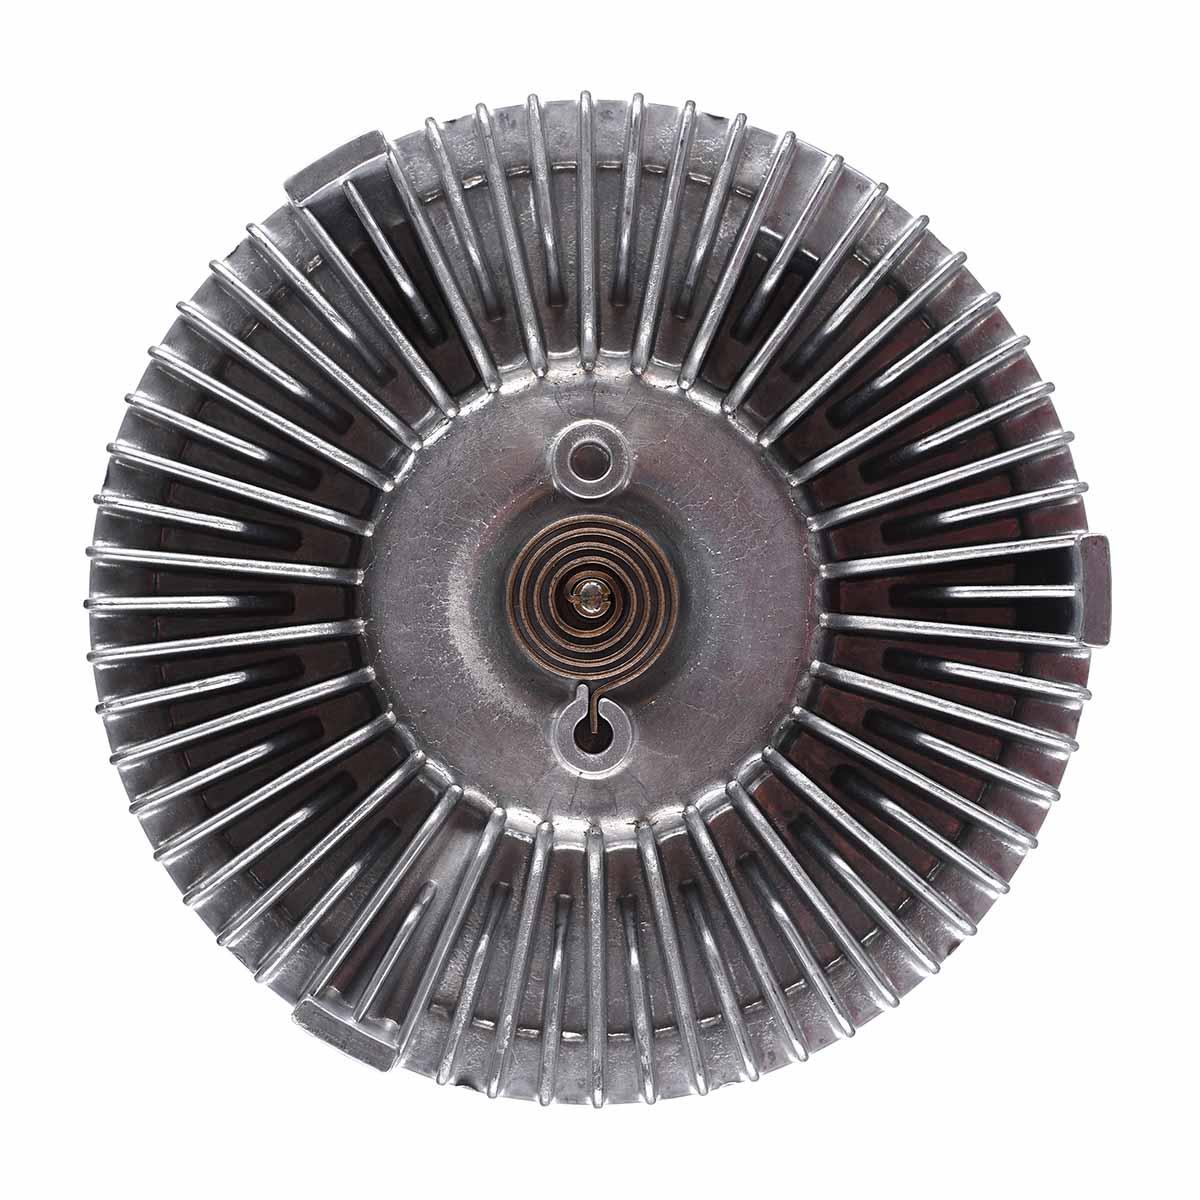 cooling fan clutch for cadillac escalade chevrolet gmc yukon savana sierrac k 1500 oldsmobile hummer h2 4 3 4 8l 5 3l 5 7l 6 0l in fans kits from  [ 1200 x 1200 Pixel ]